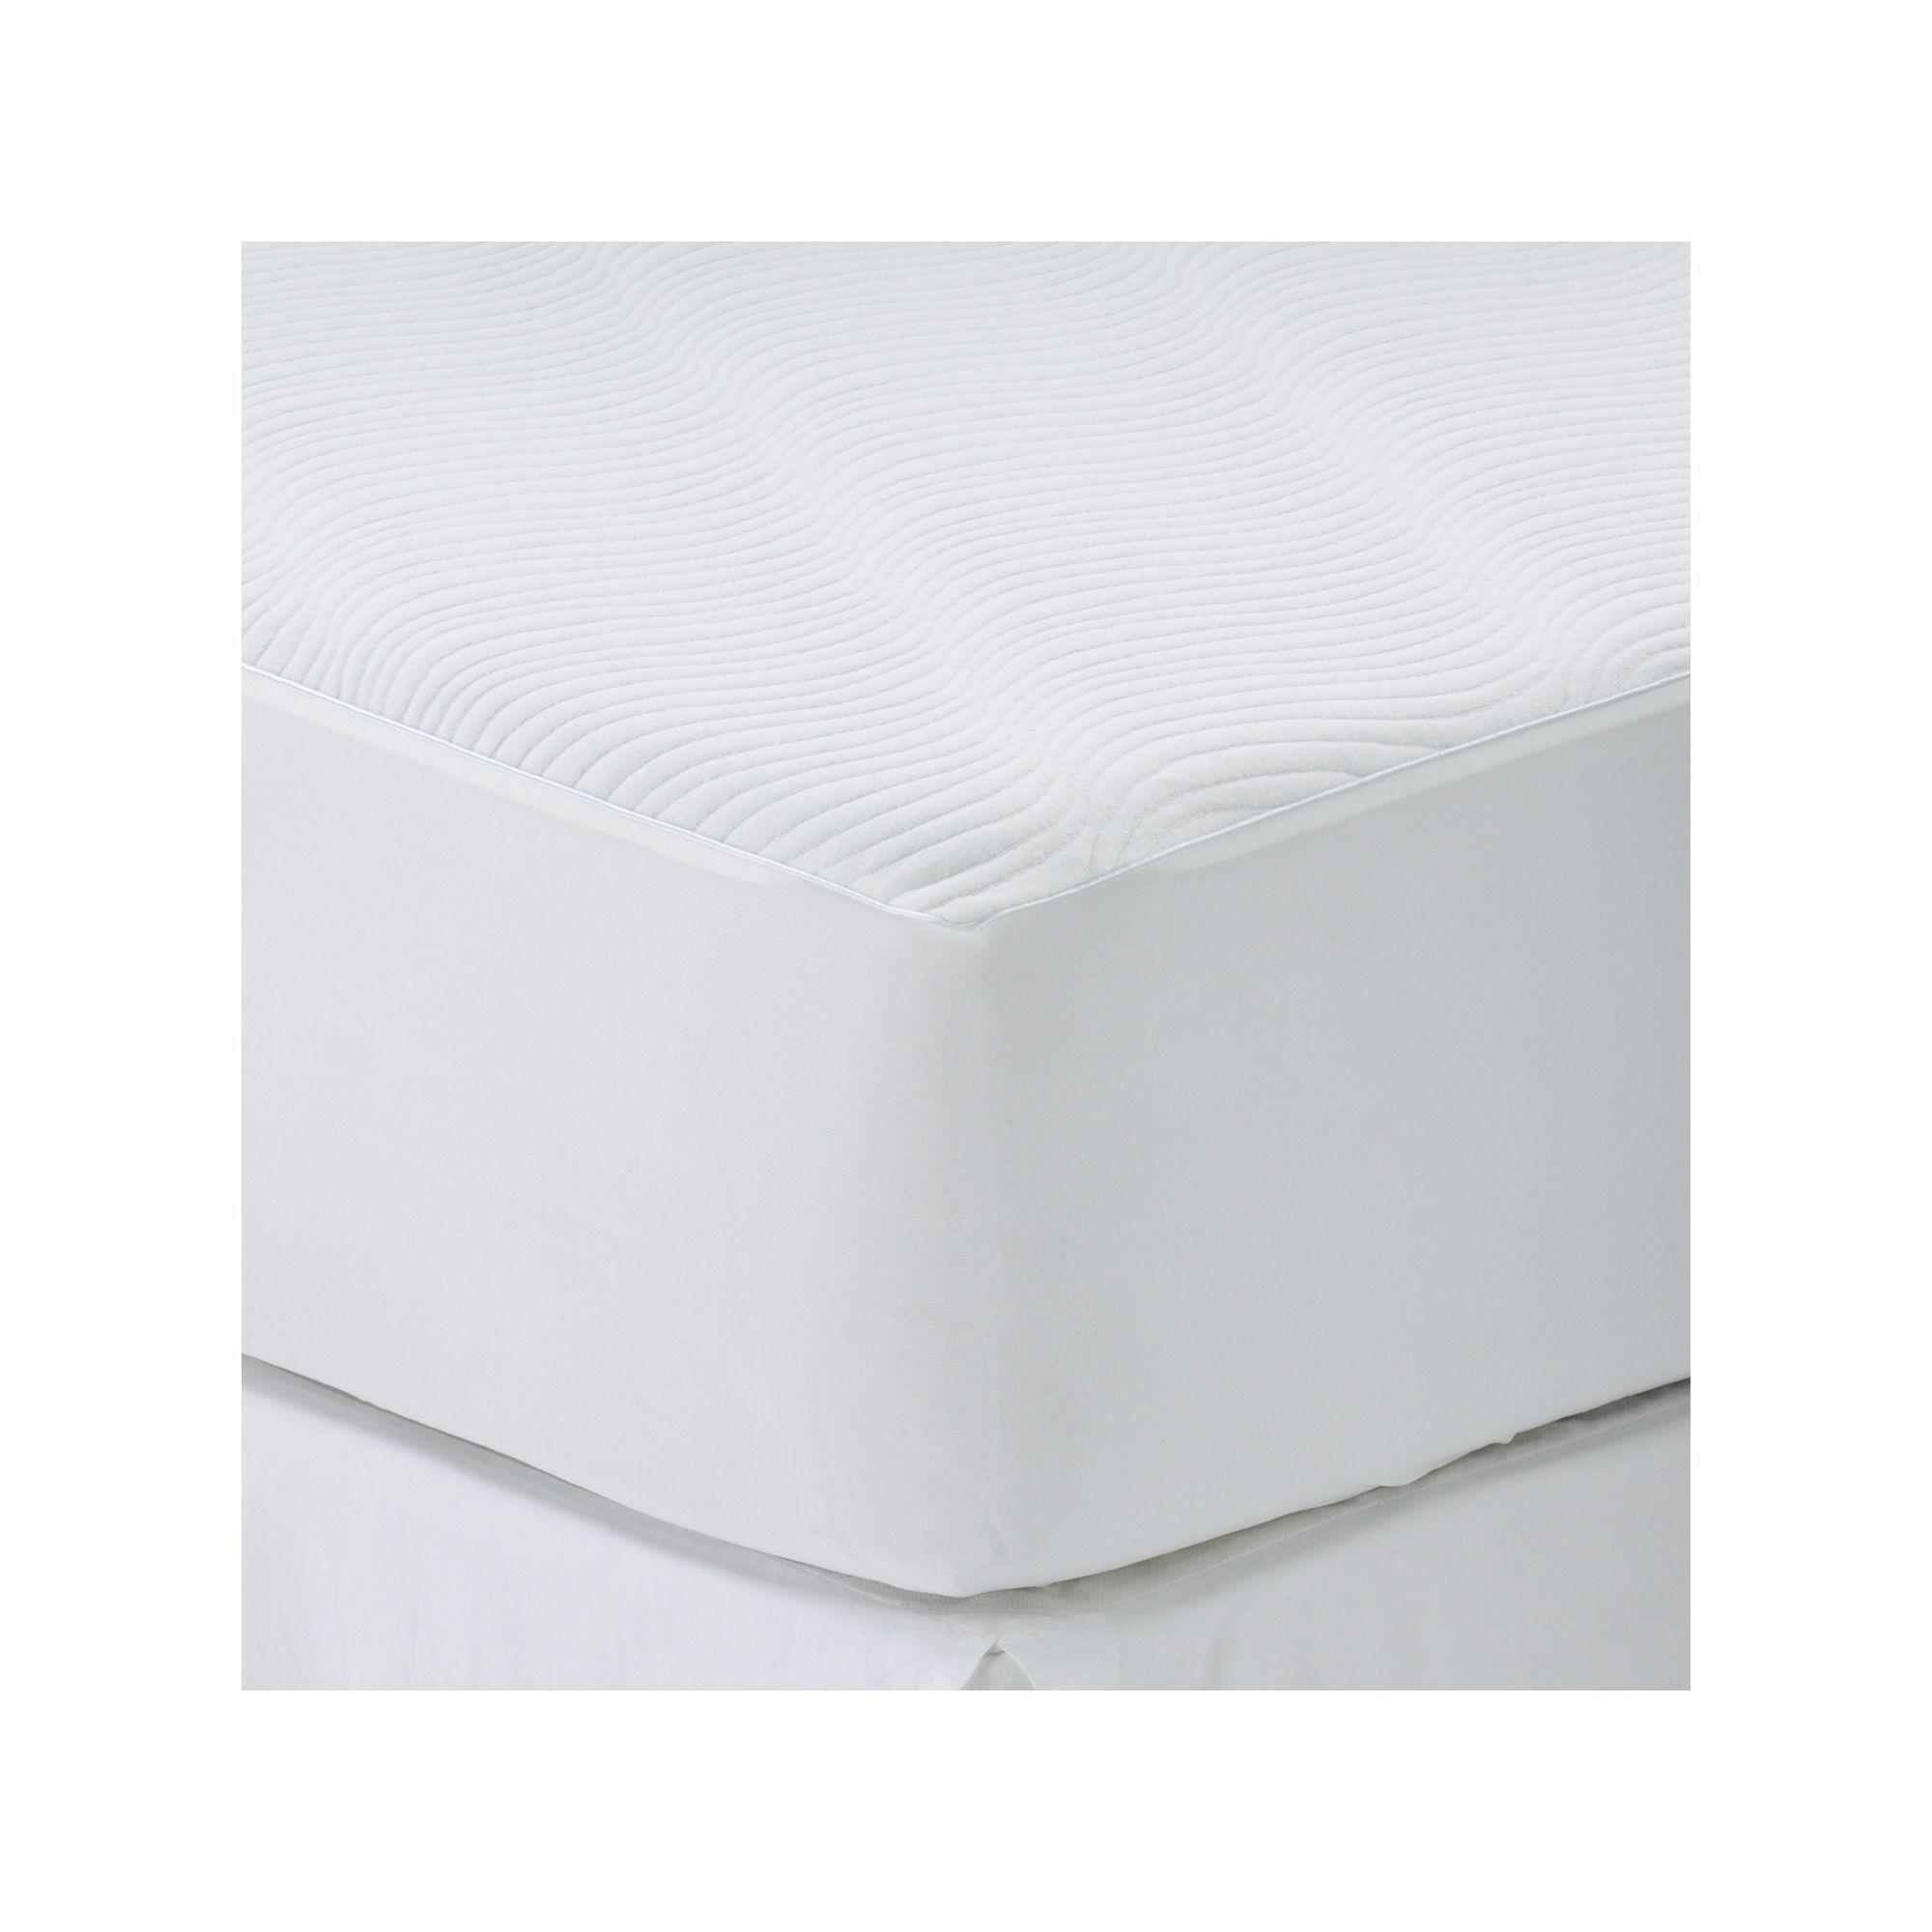 sealy posturepedic luxury knit waterproof stain release mattress